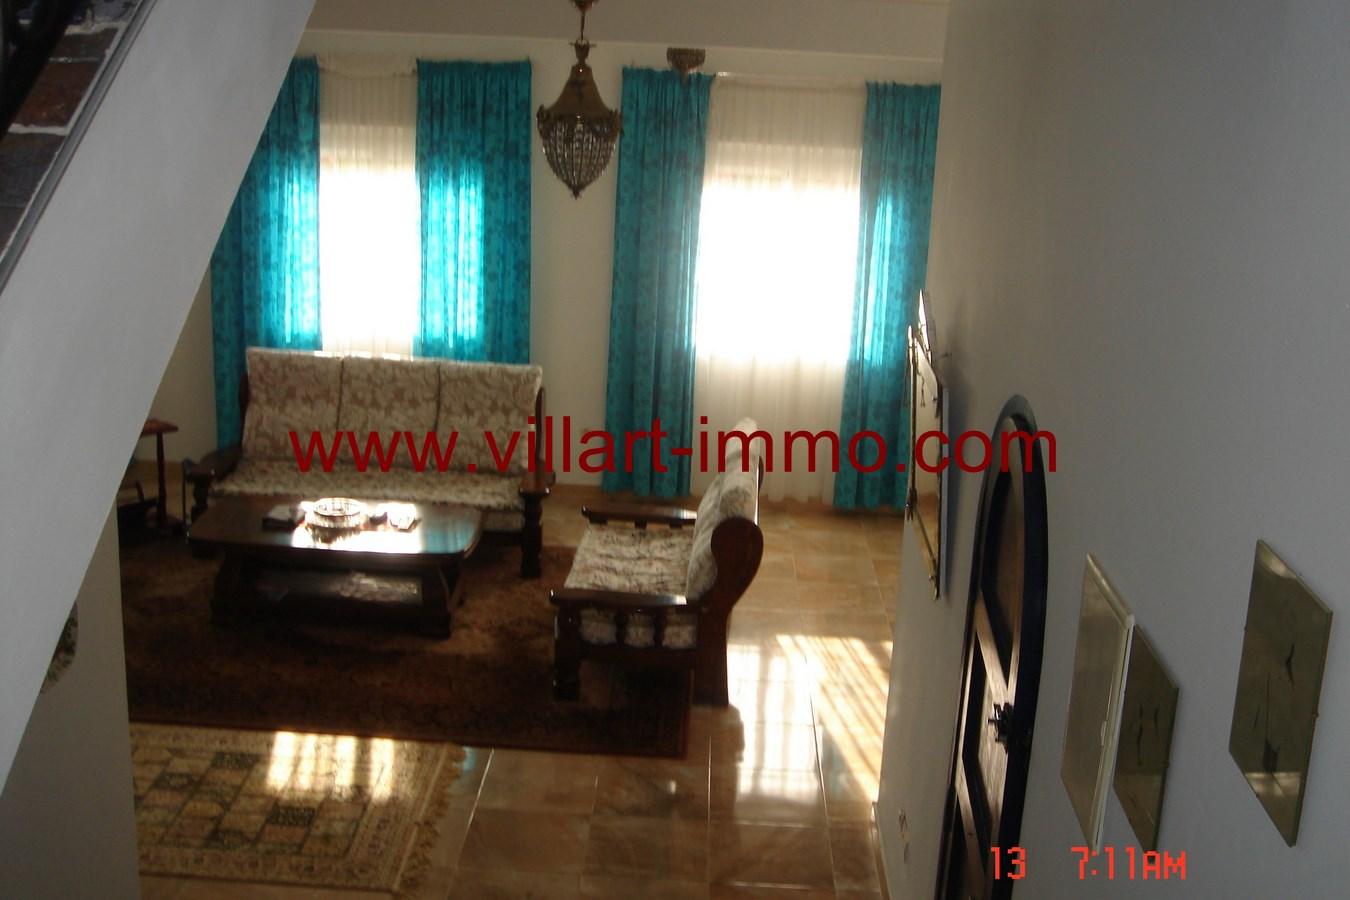 3-a-vendre-villa-tanger-hijriyin-salon-vv430-villart-immo